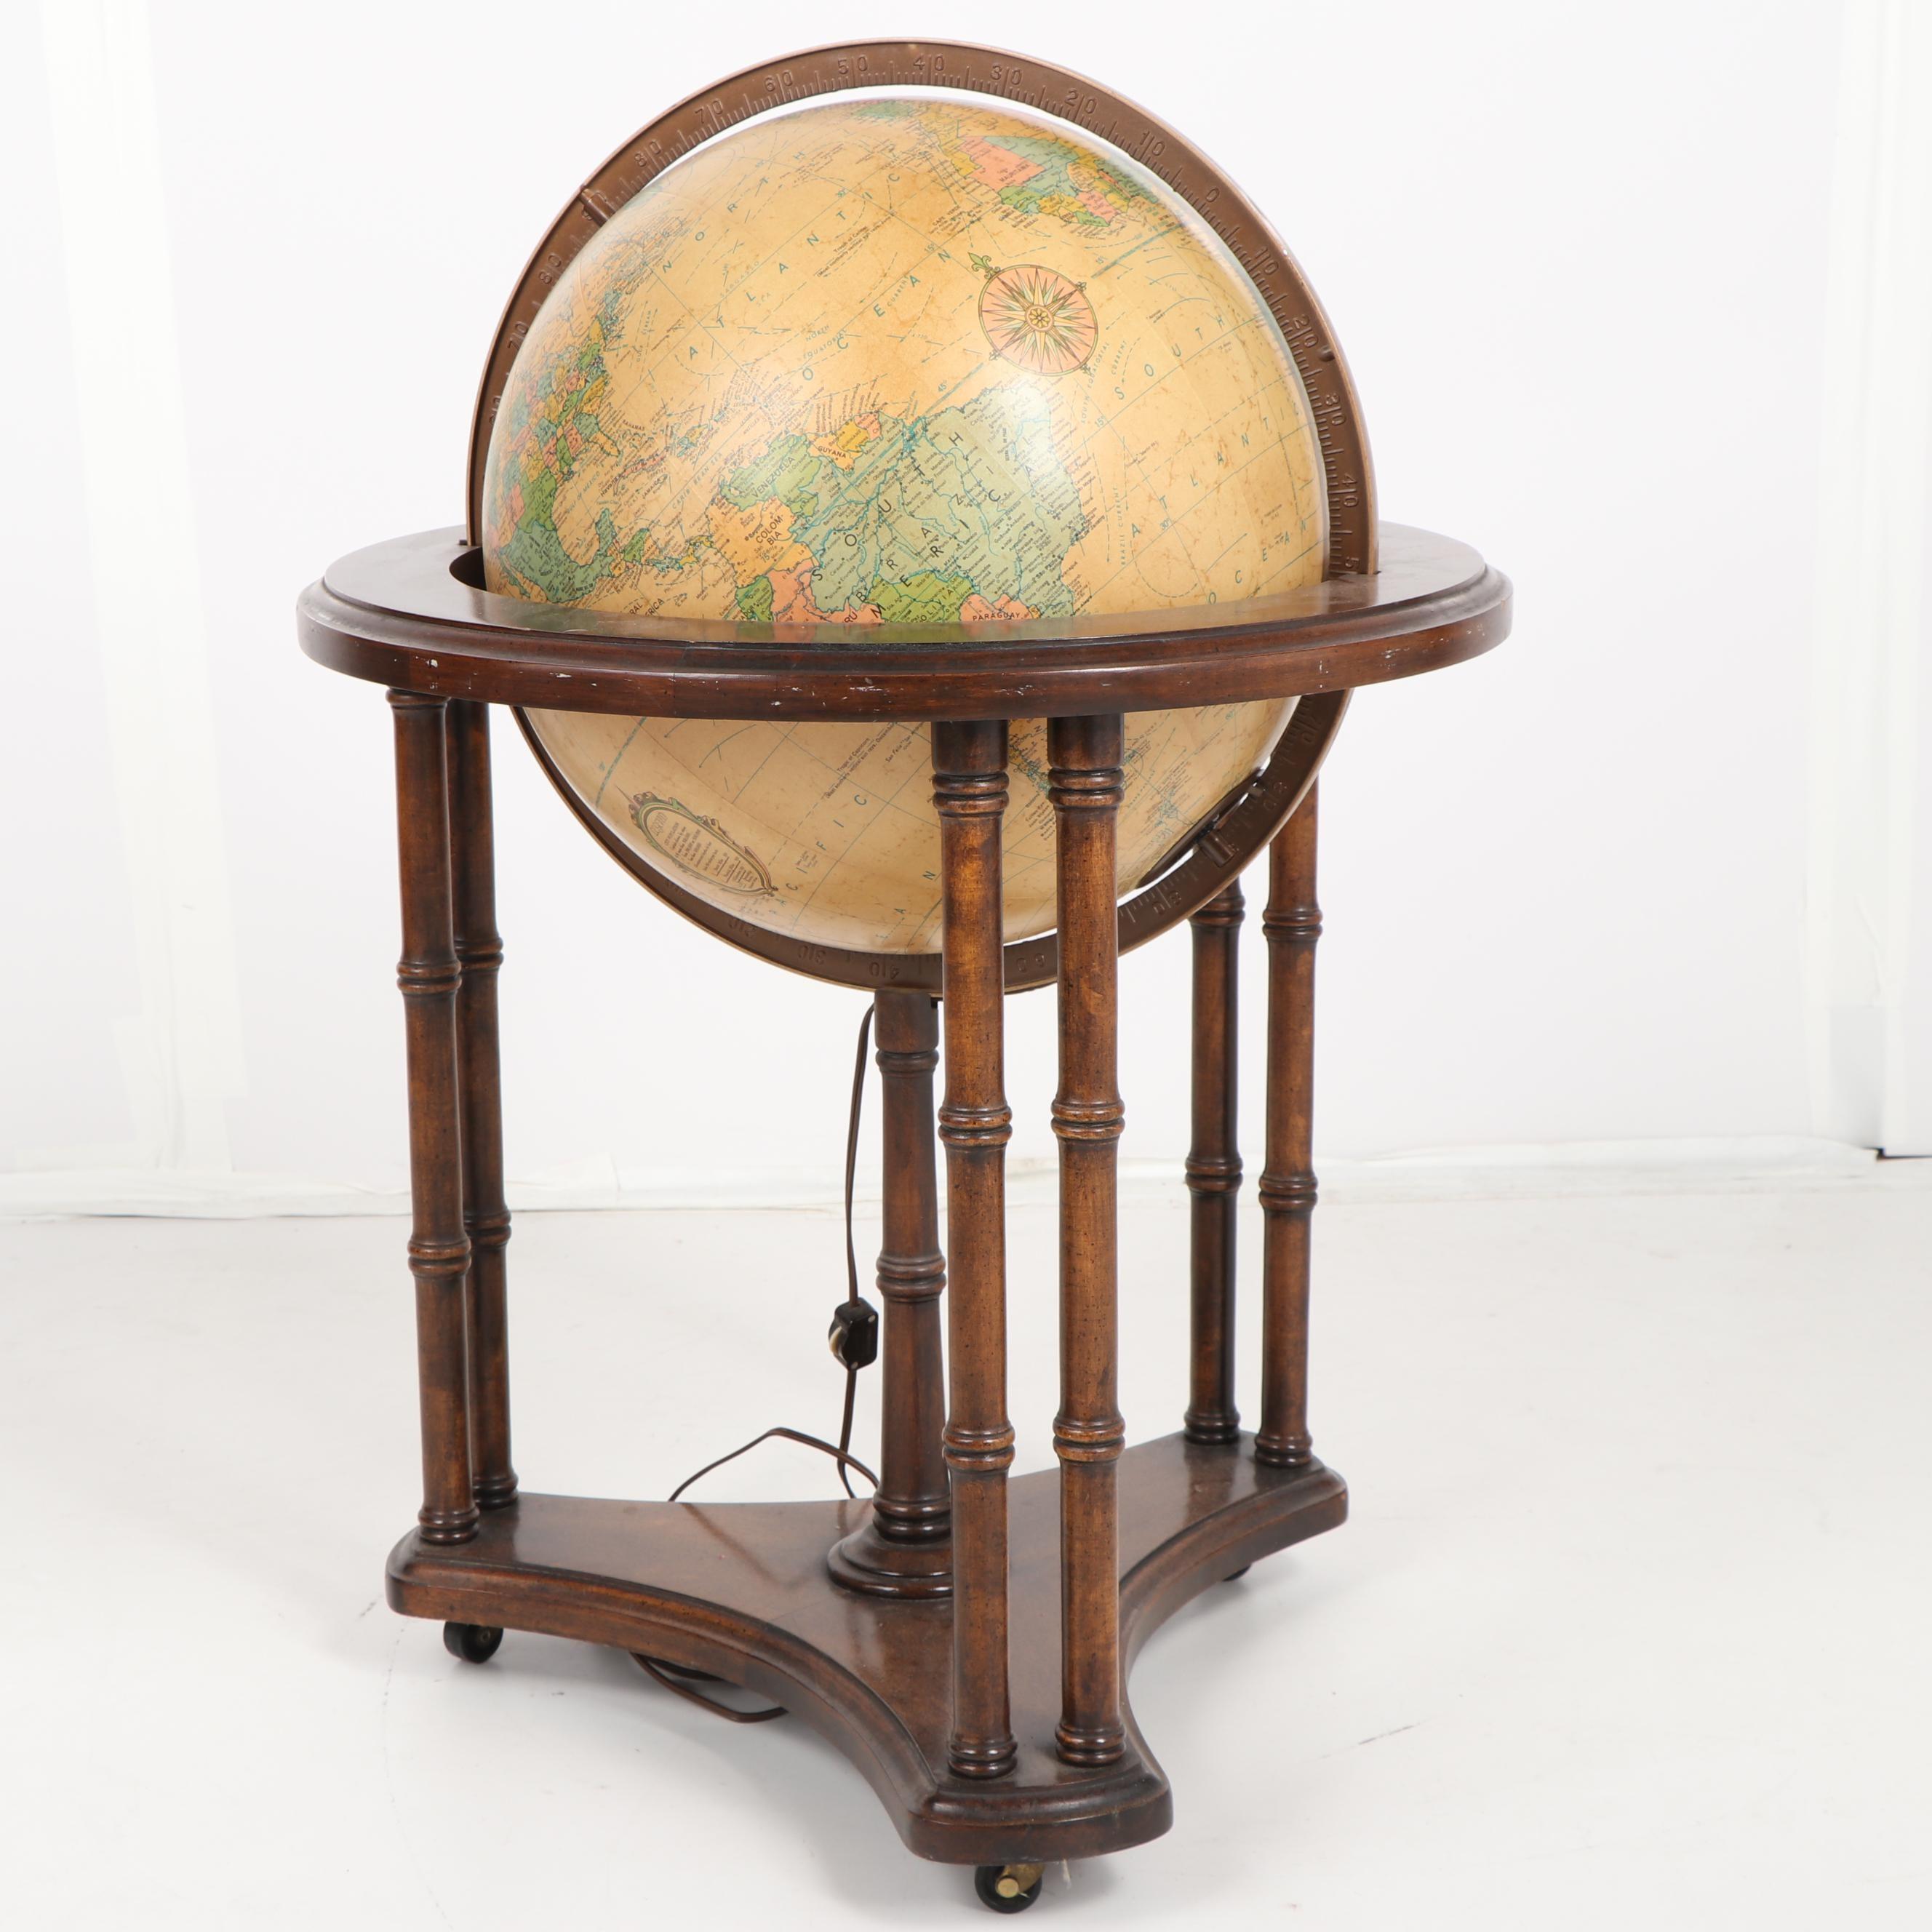 Vintage Replogle Illuminated Globe in Stand